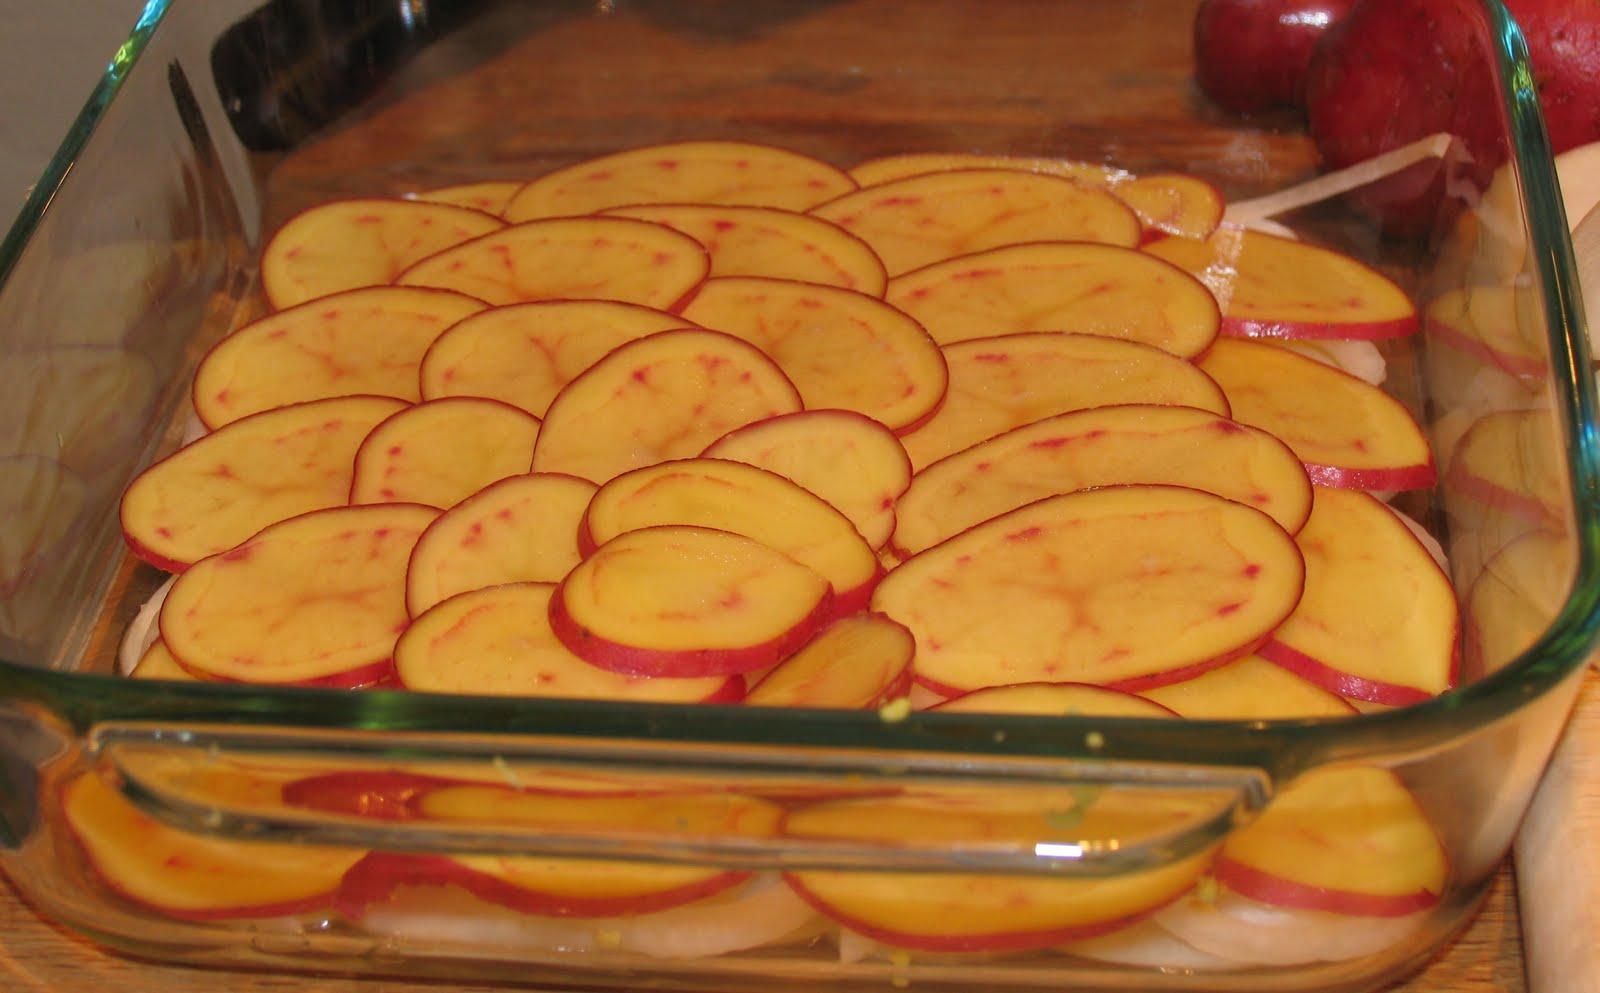 ... Discerning Kitchen: Vegan Mofo Day 8: Scalloped Turnips and Potatoes